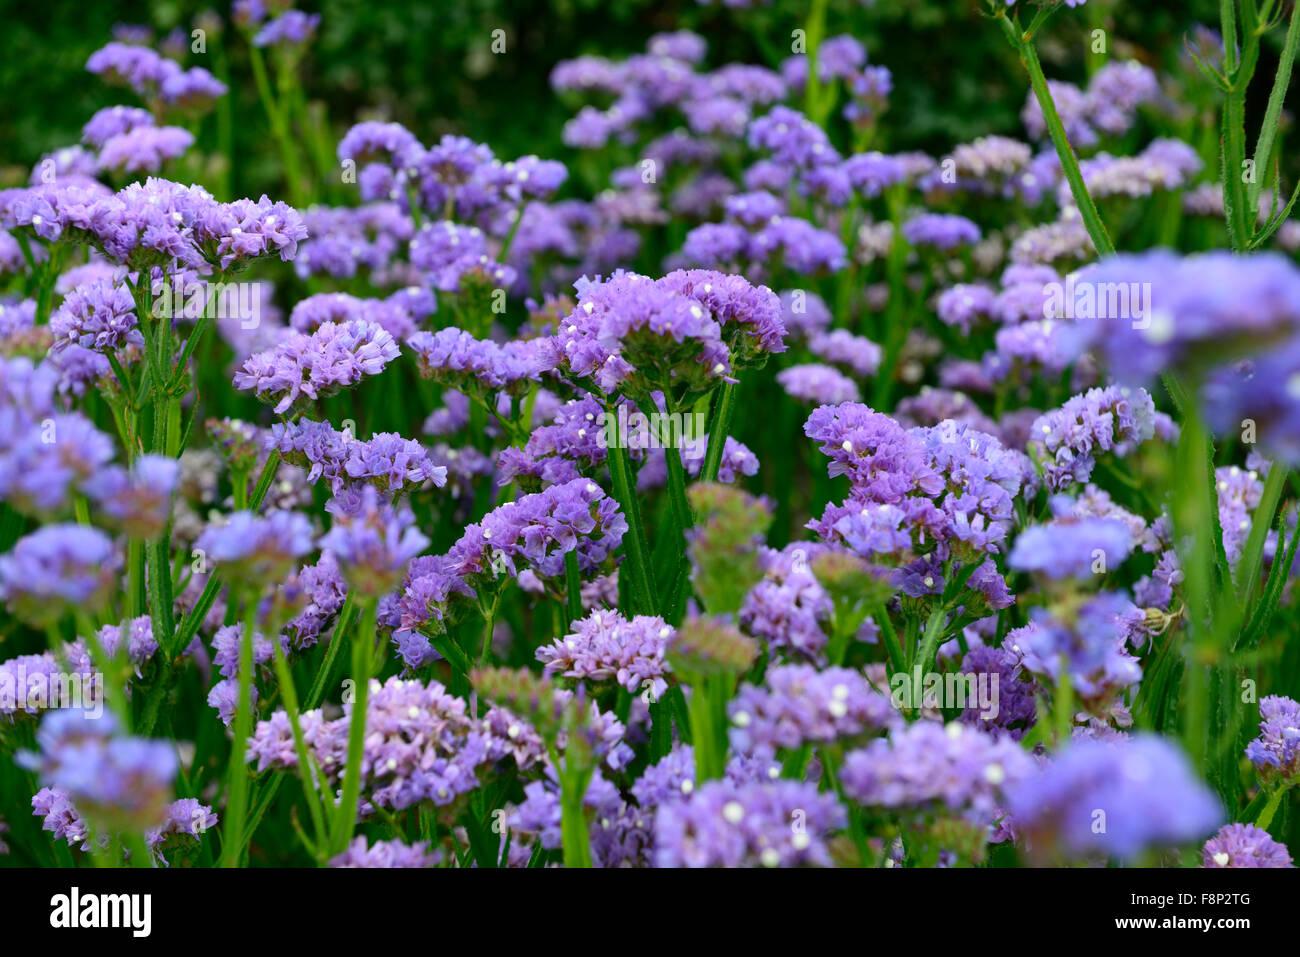 Limonium sinuatum sky blue statice annual annuals flowers flowering limonium sinuatum sky blue statice annual annuals flowers flowering flower bed display mass massed profusion profuse rm floral izmirmasajfo Gallery